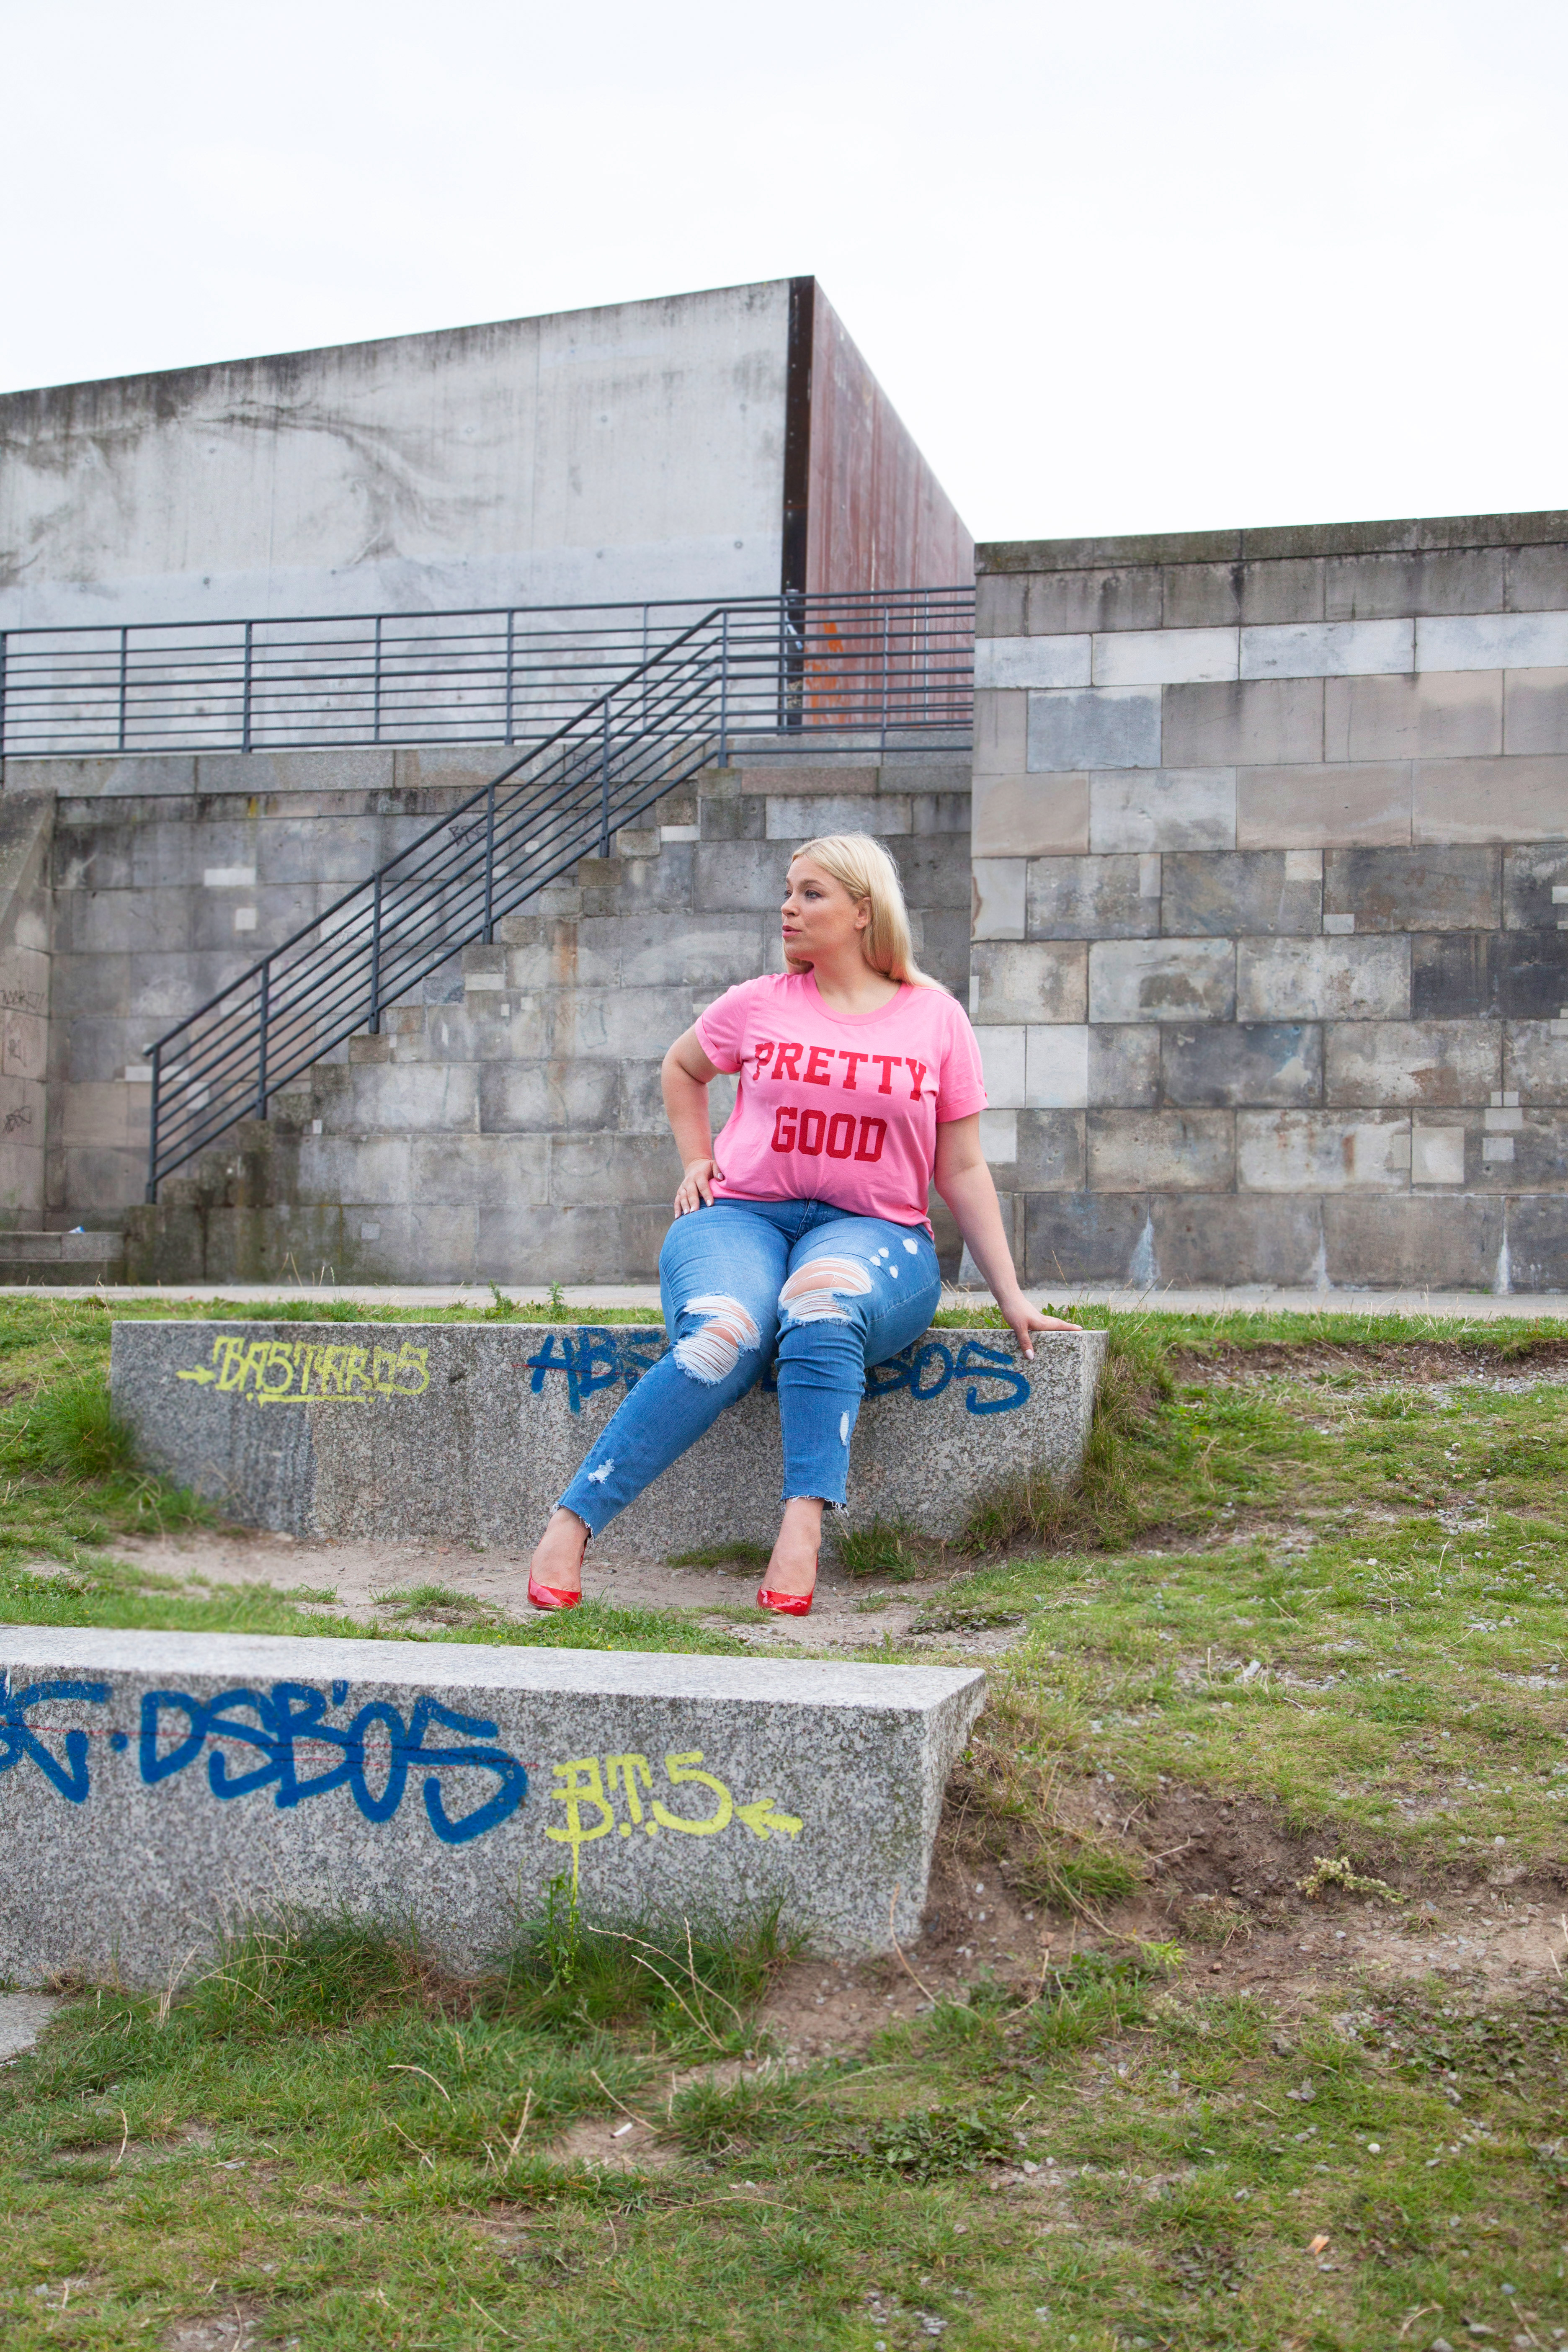 Caterina-pogorzelski-megabambi-plusssizeblogger